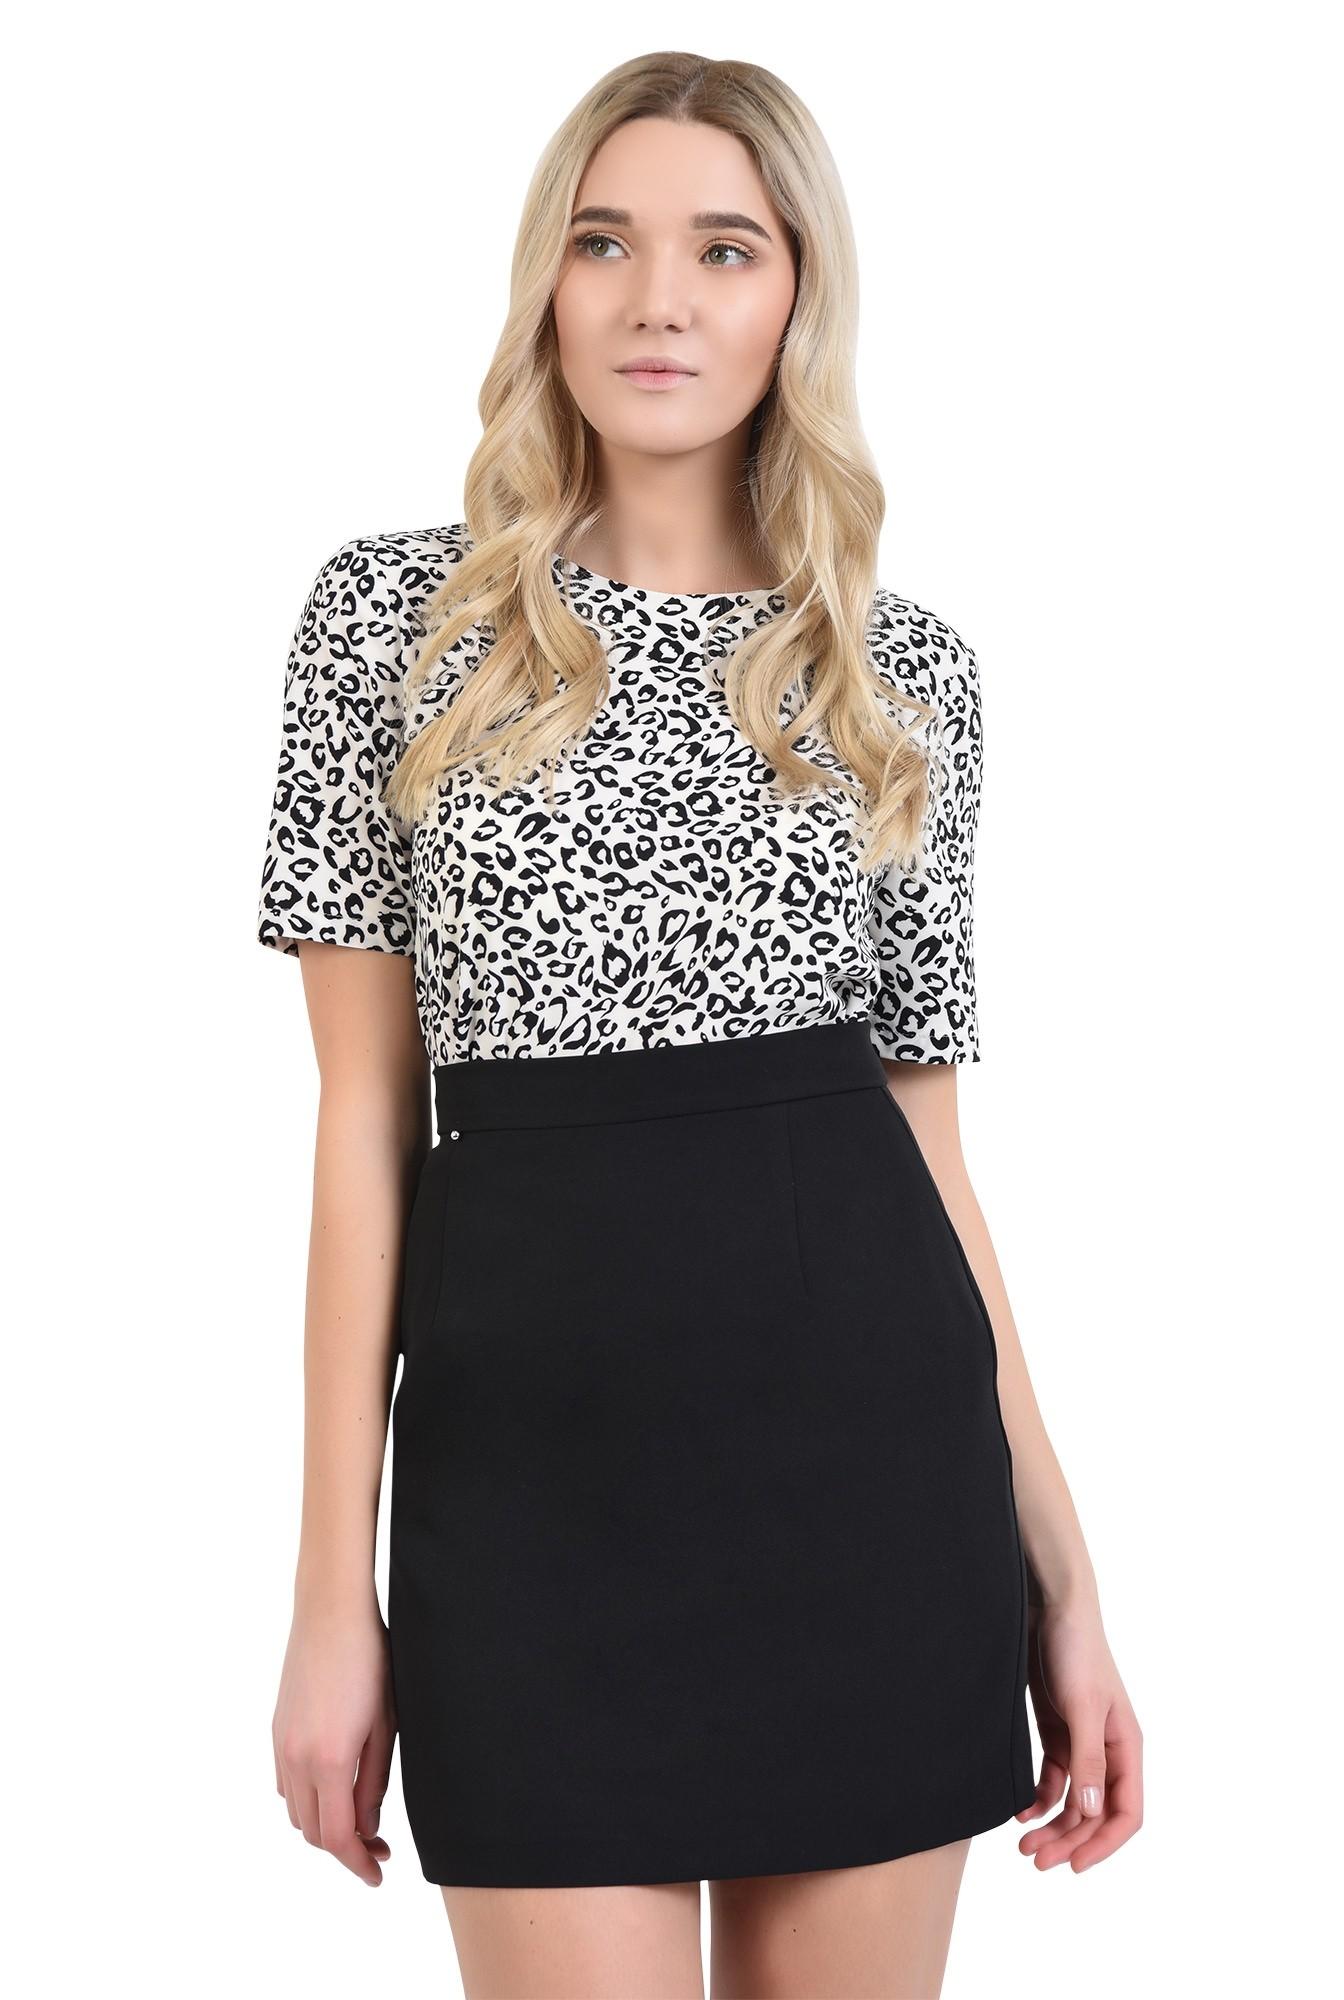 0 - bluze online, bluza de zi, imprimeu leopard, alb-negru, decolteu rotund la baza gatului